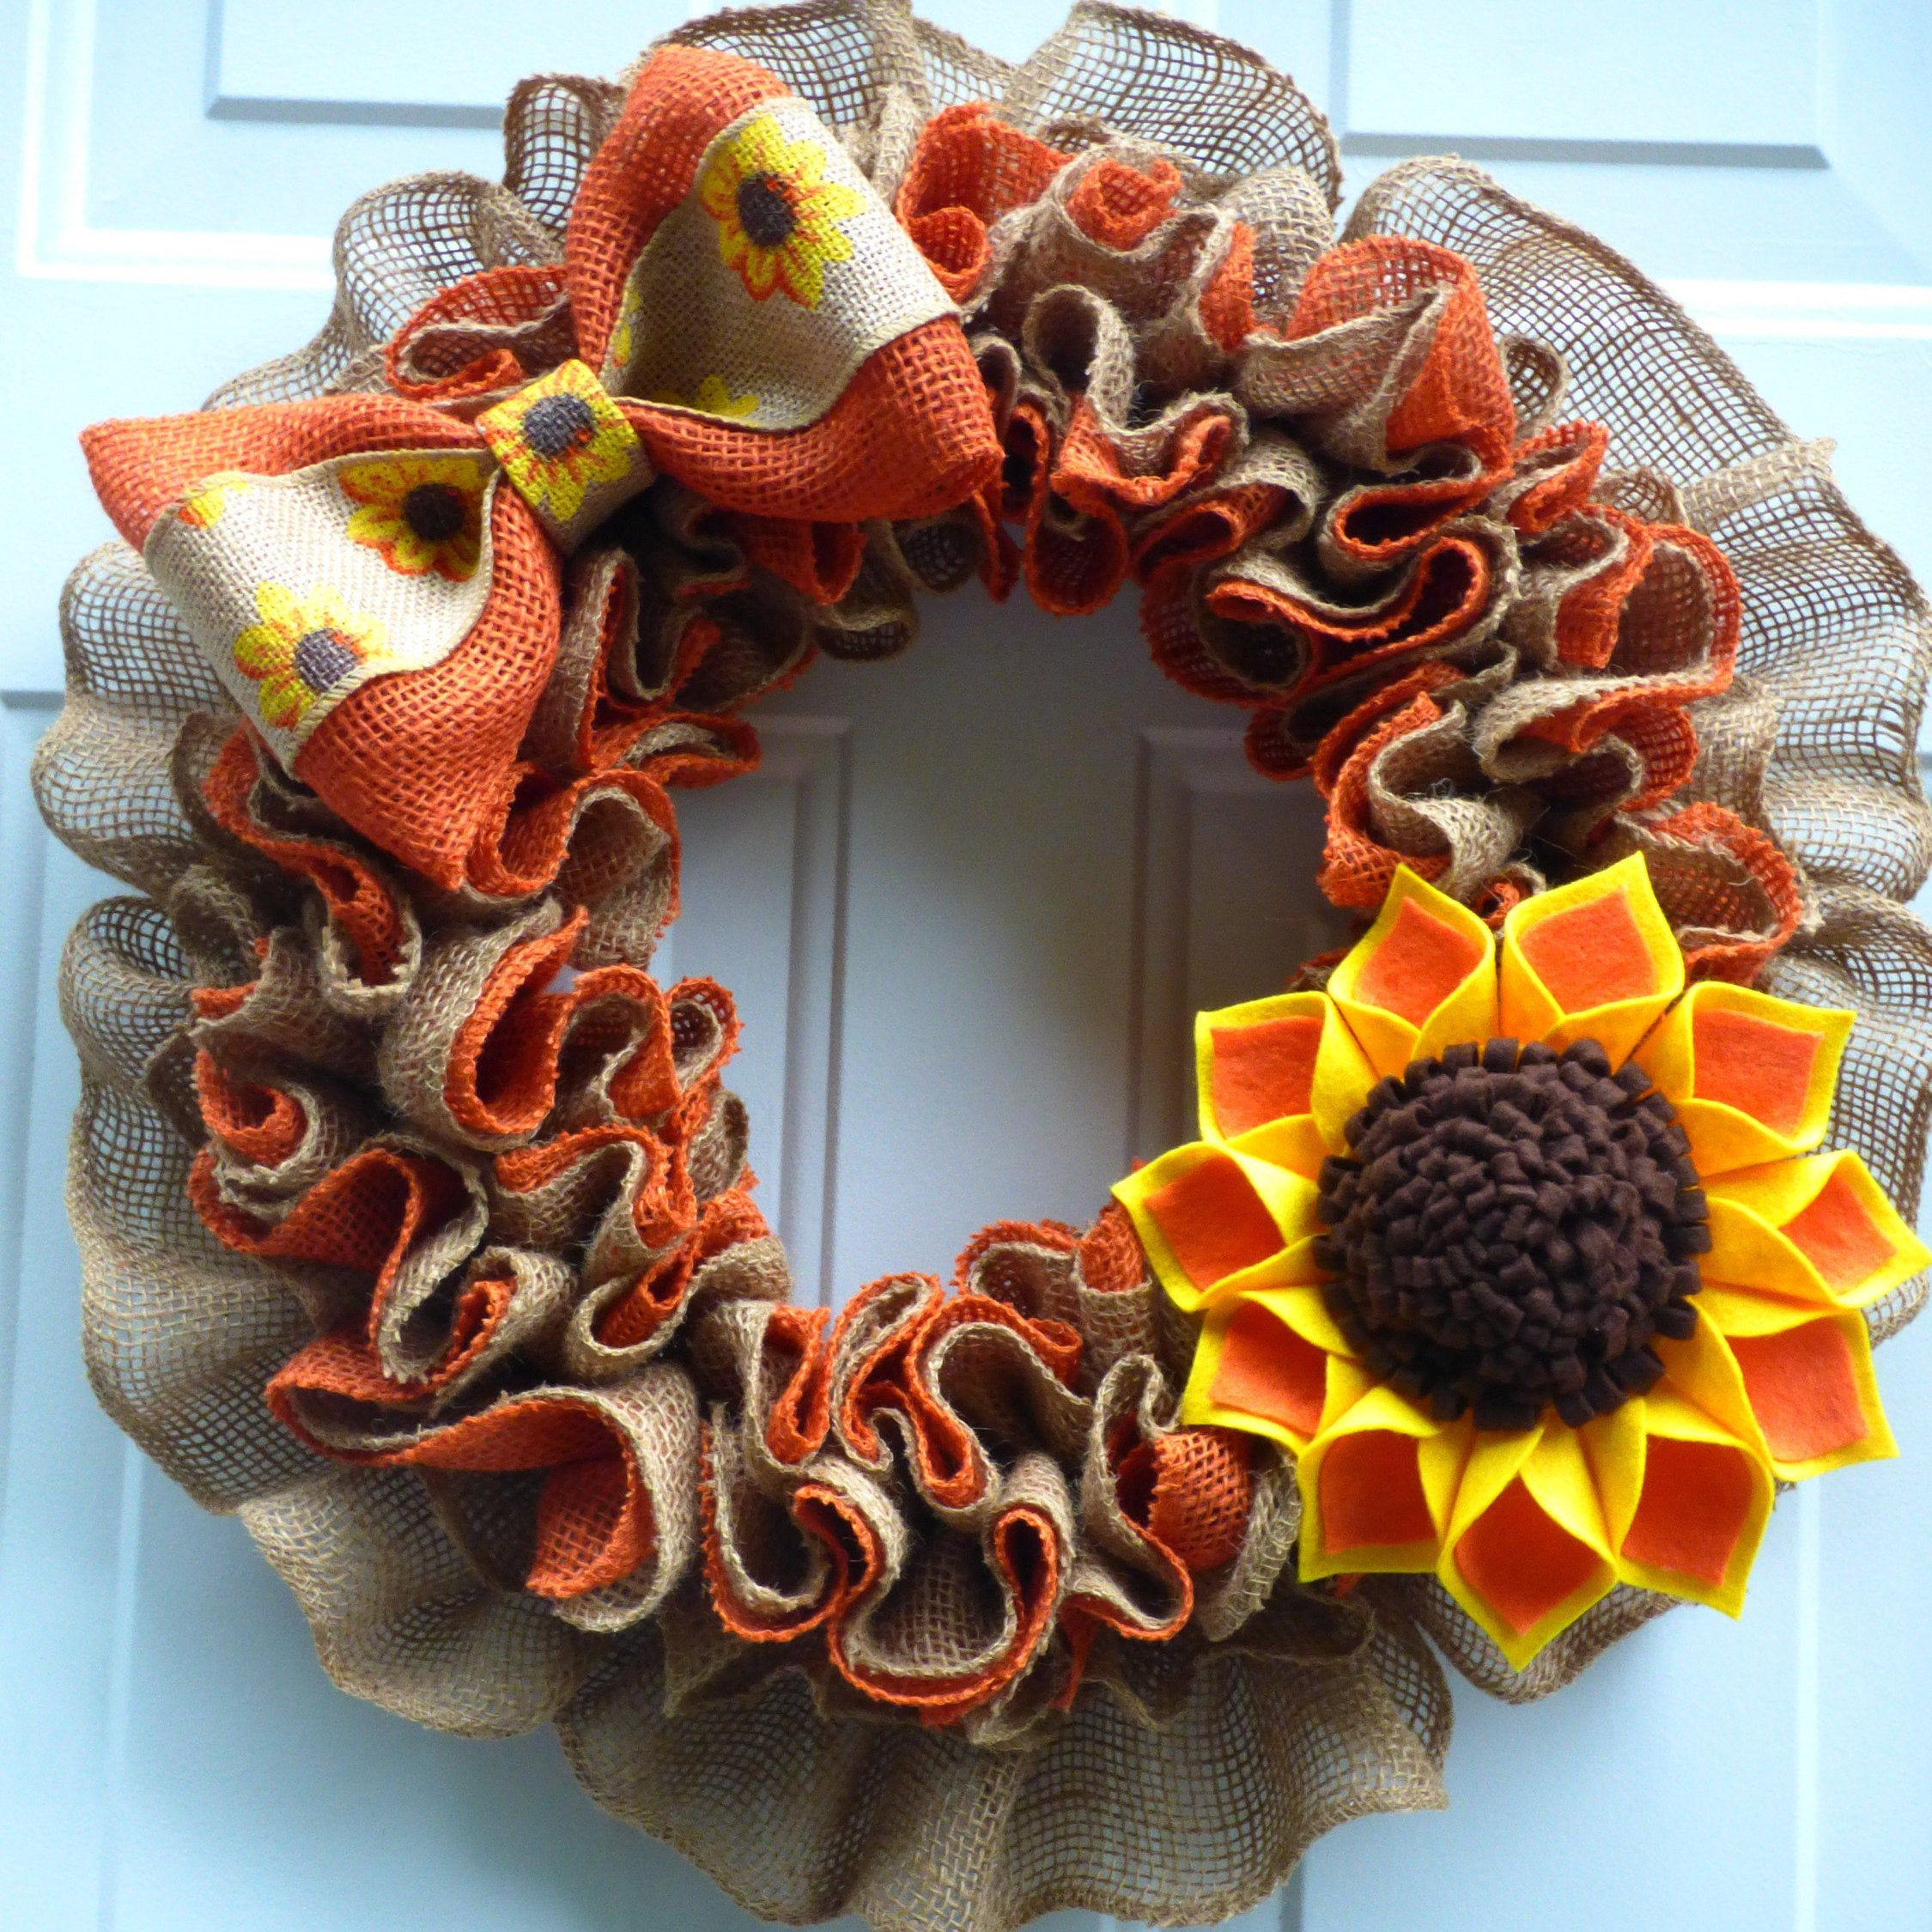 Ruffled natural burlap Harvest Wreath